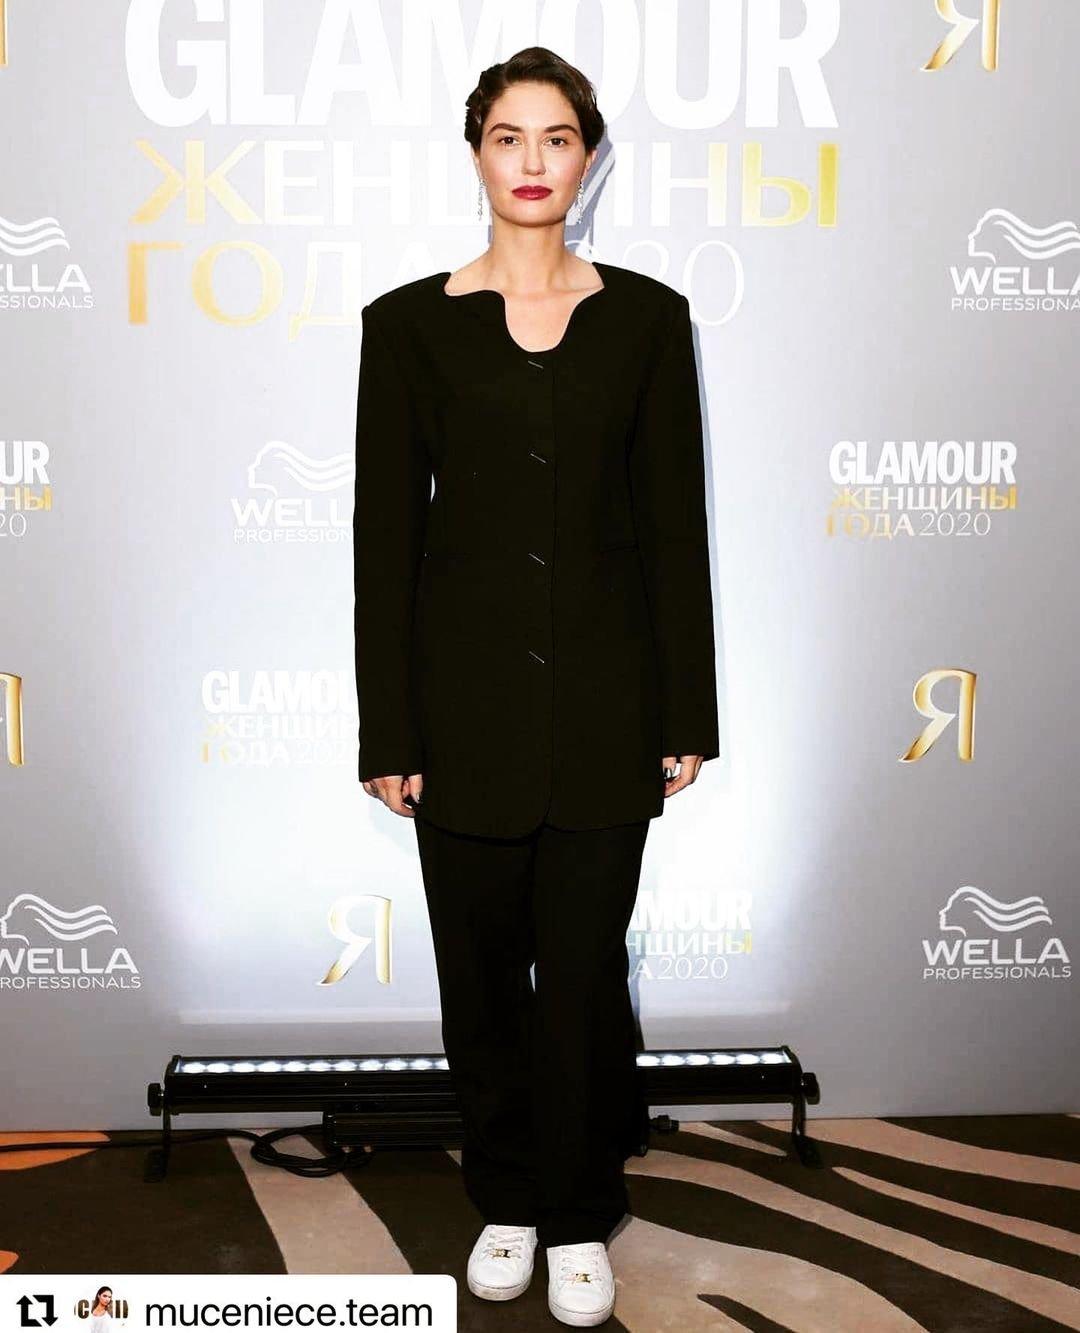 Агата Муцениеце предстала в стильном костюме и кедах на премии Glamour